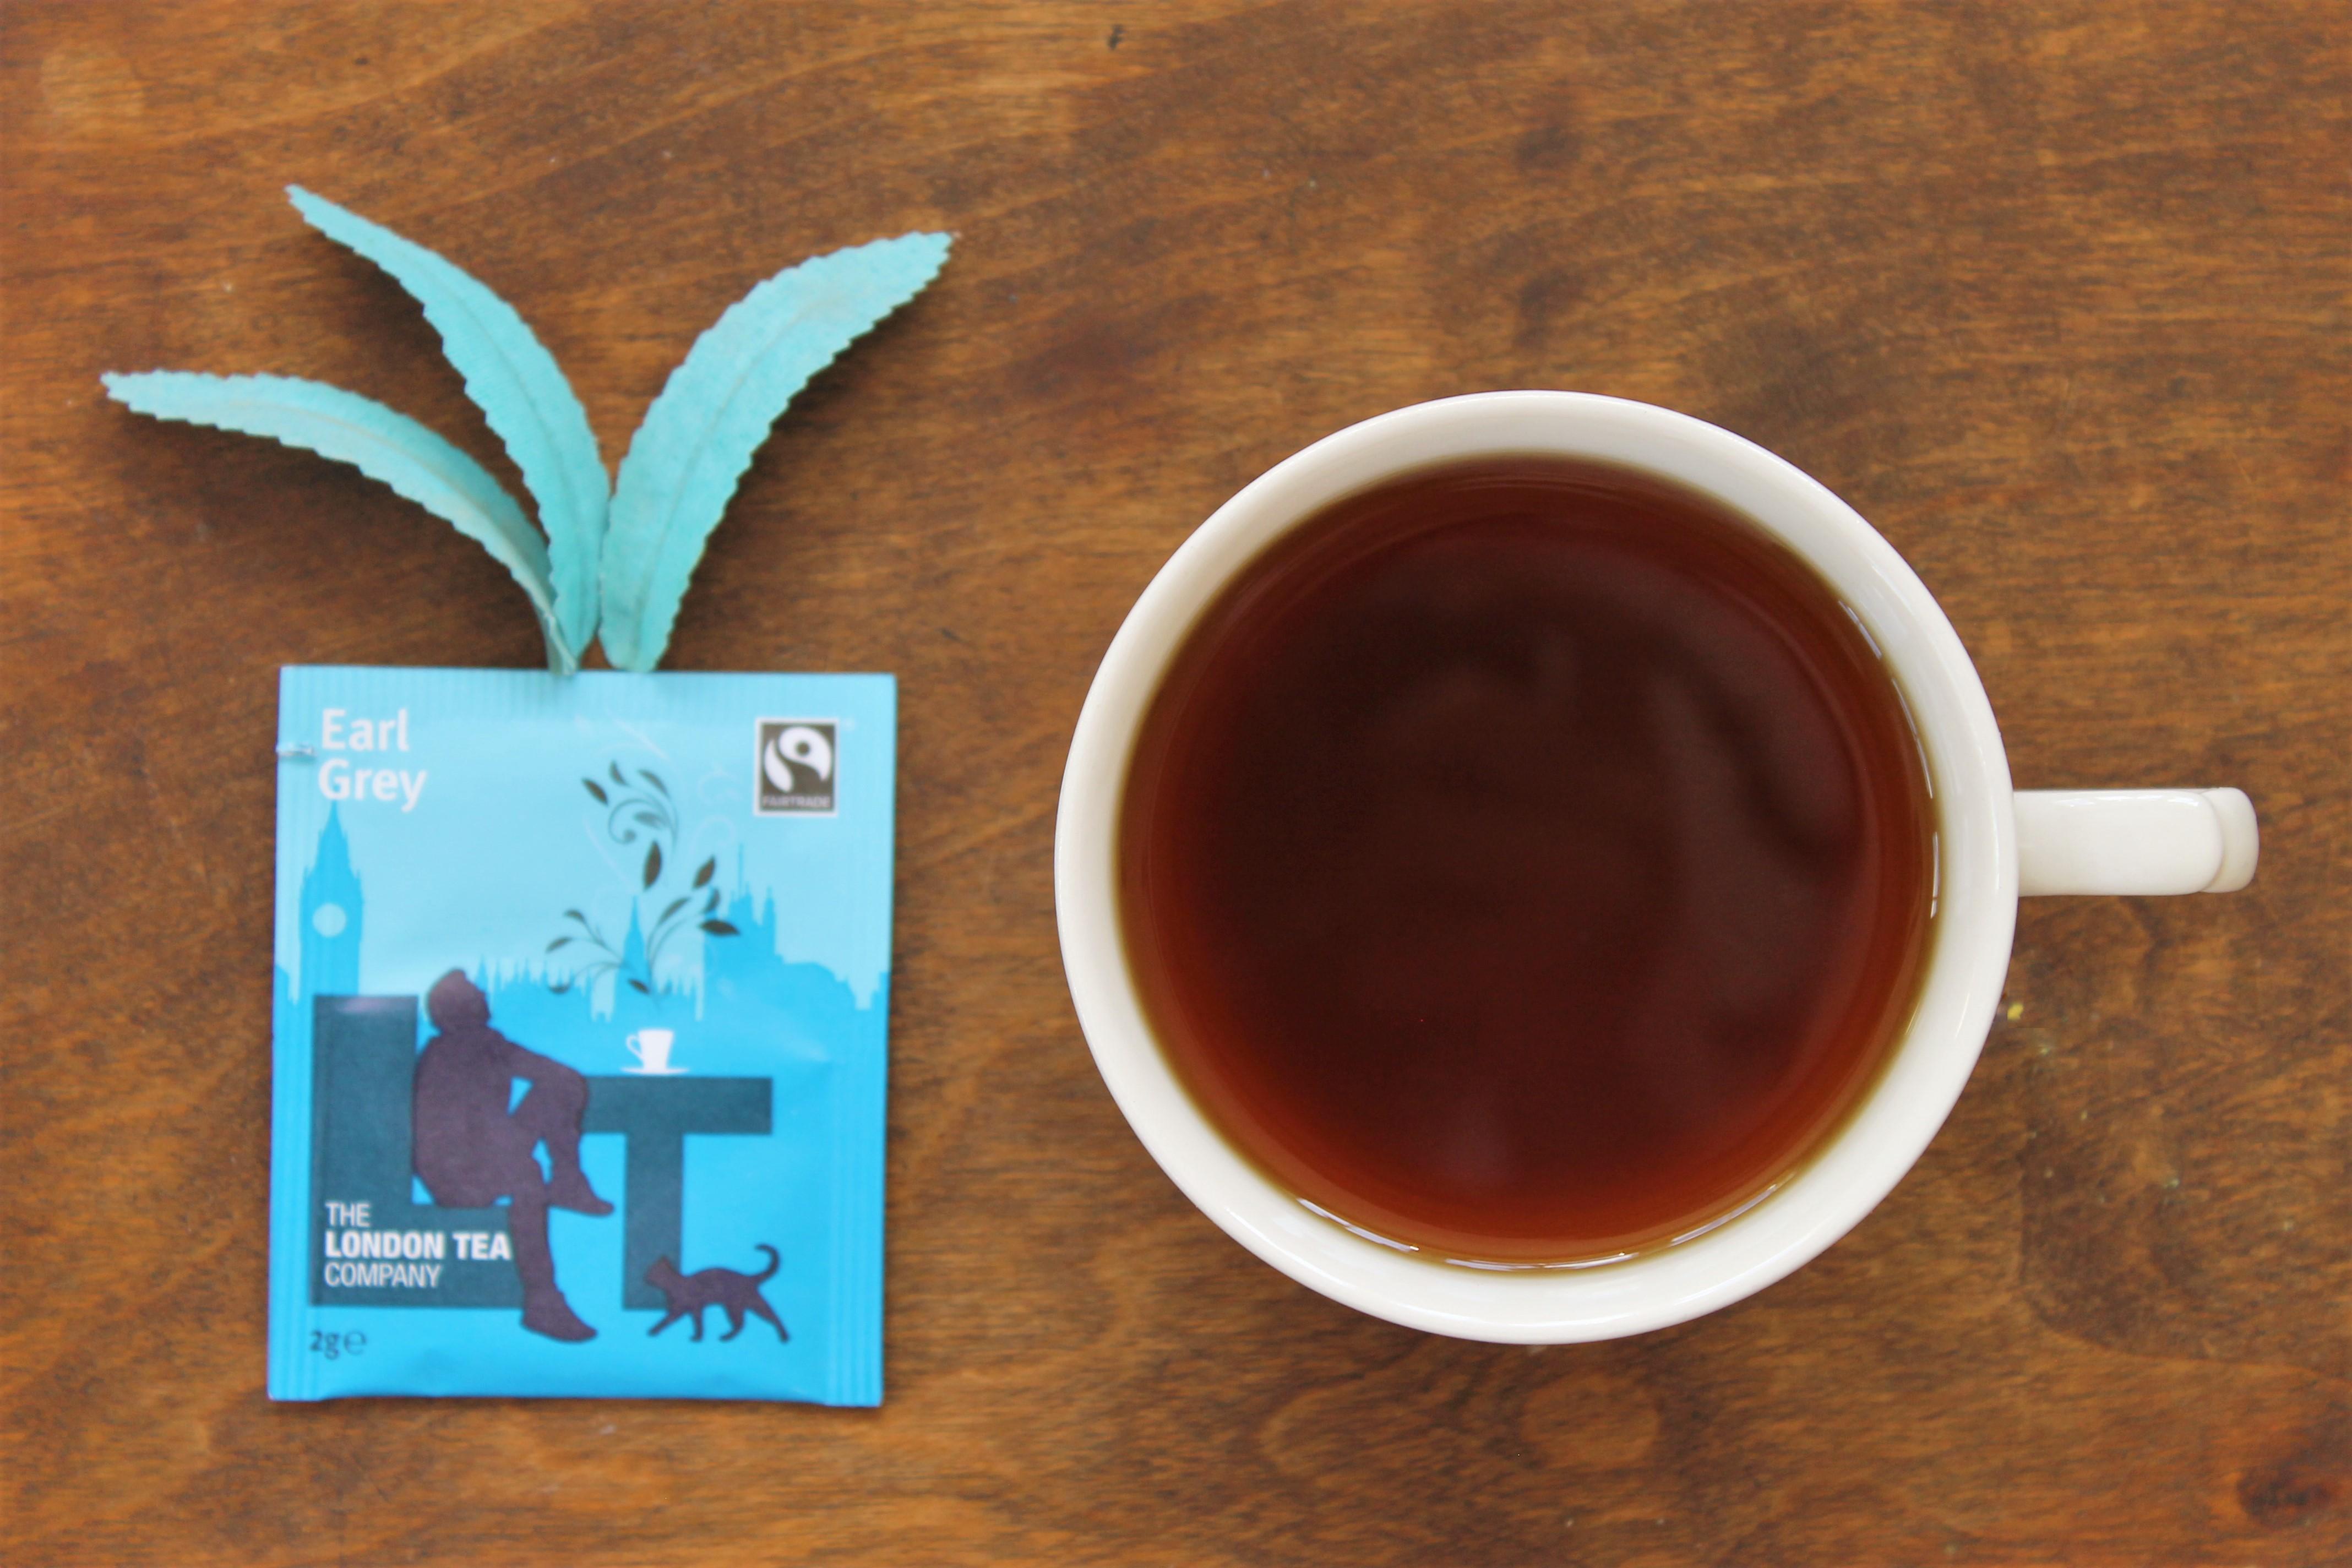 The London Tea Company Earl Grey Review